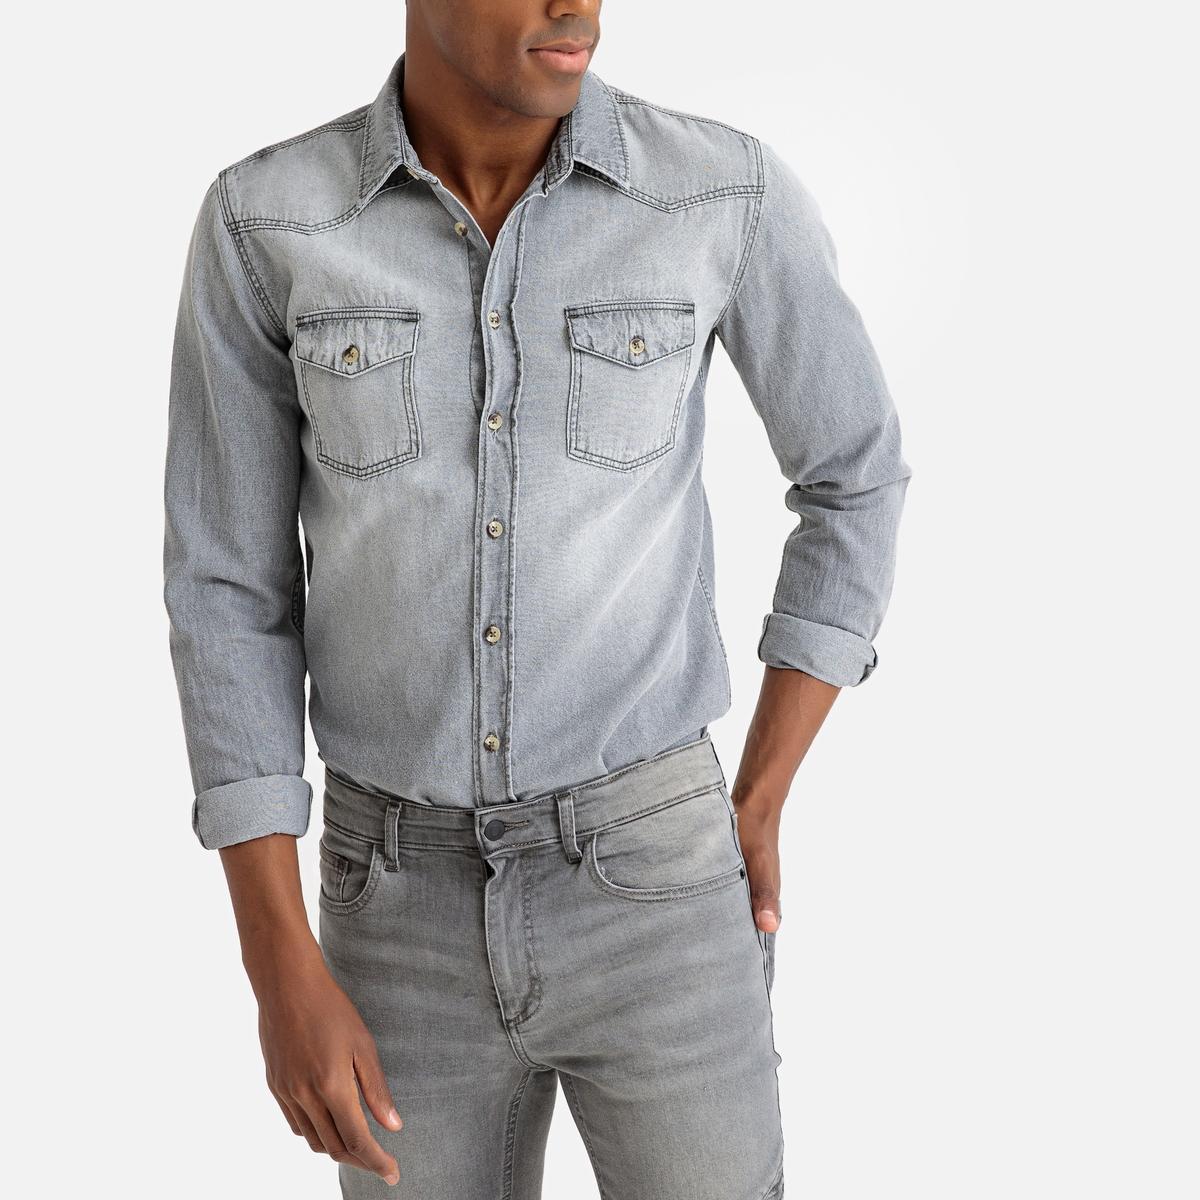 Camisa recta de denim, manga larga